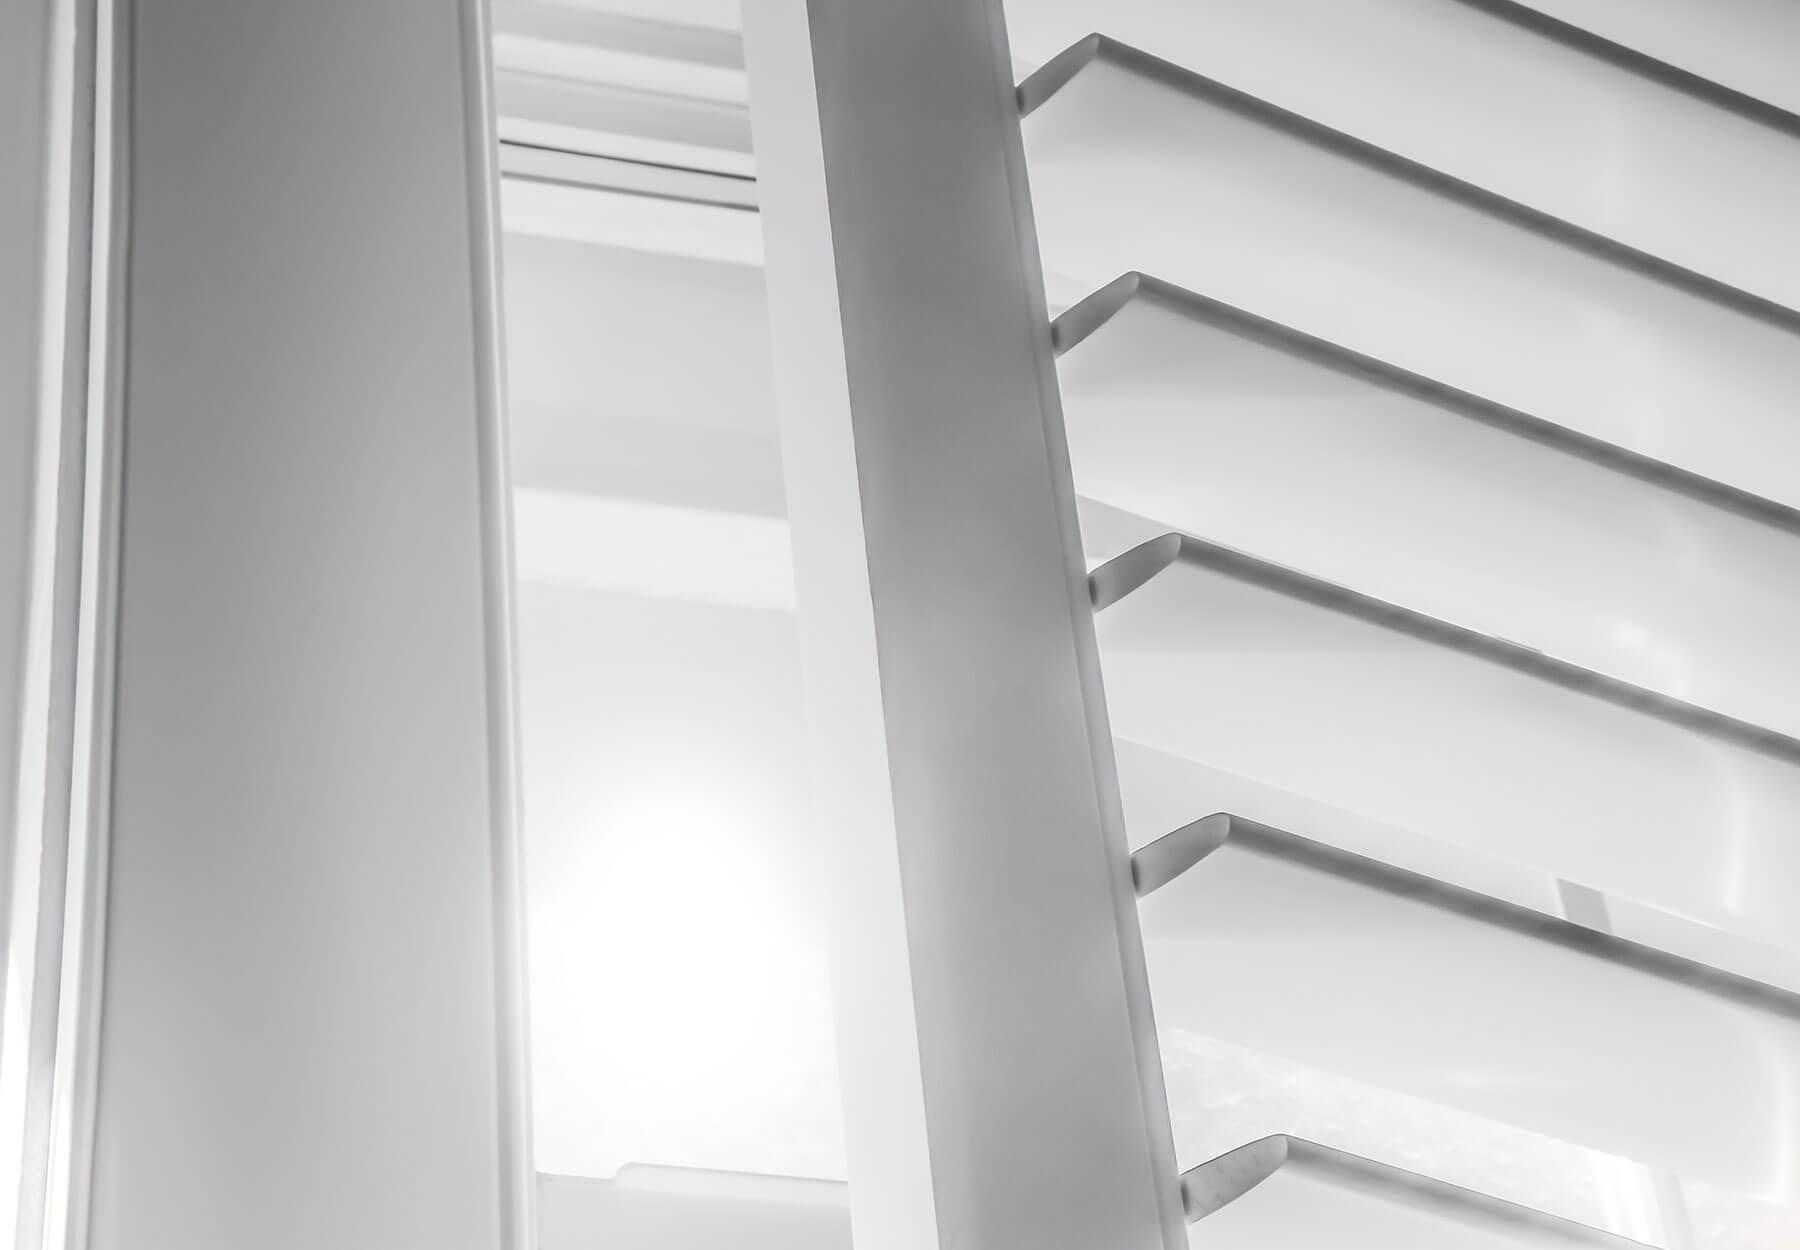 A close-up of vinyl shutters